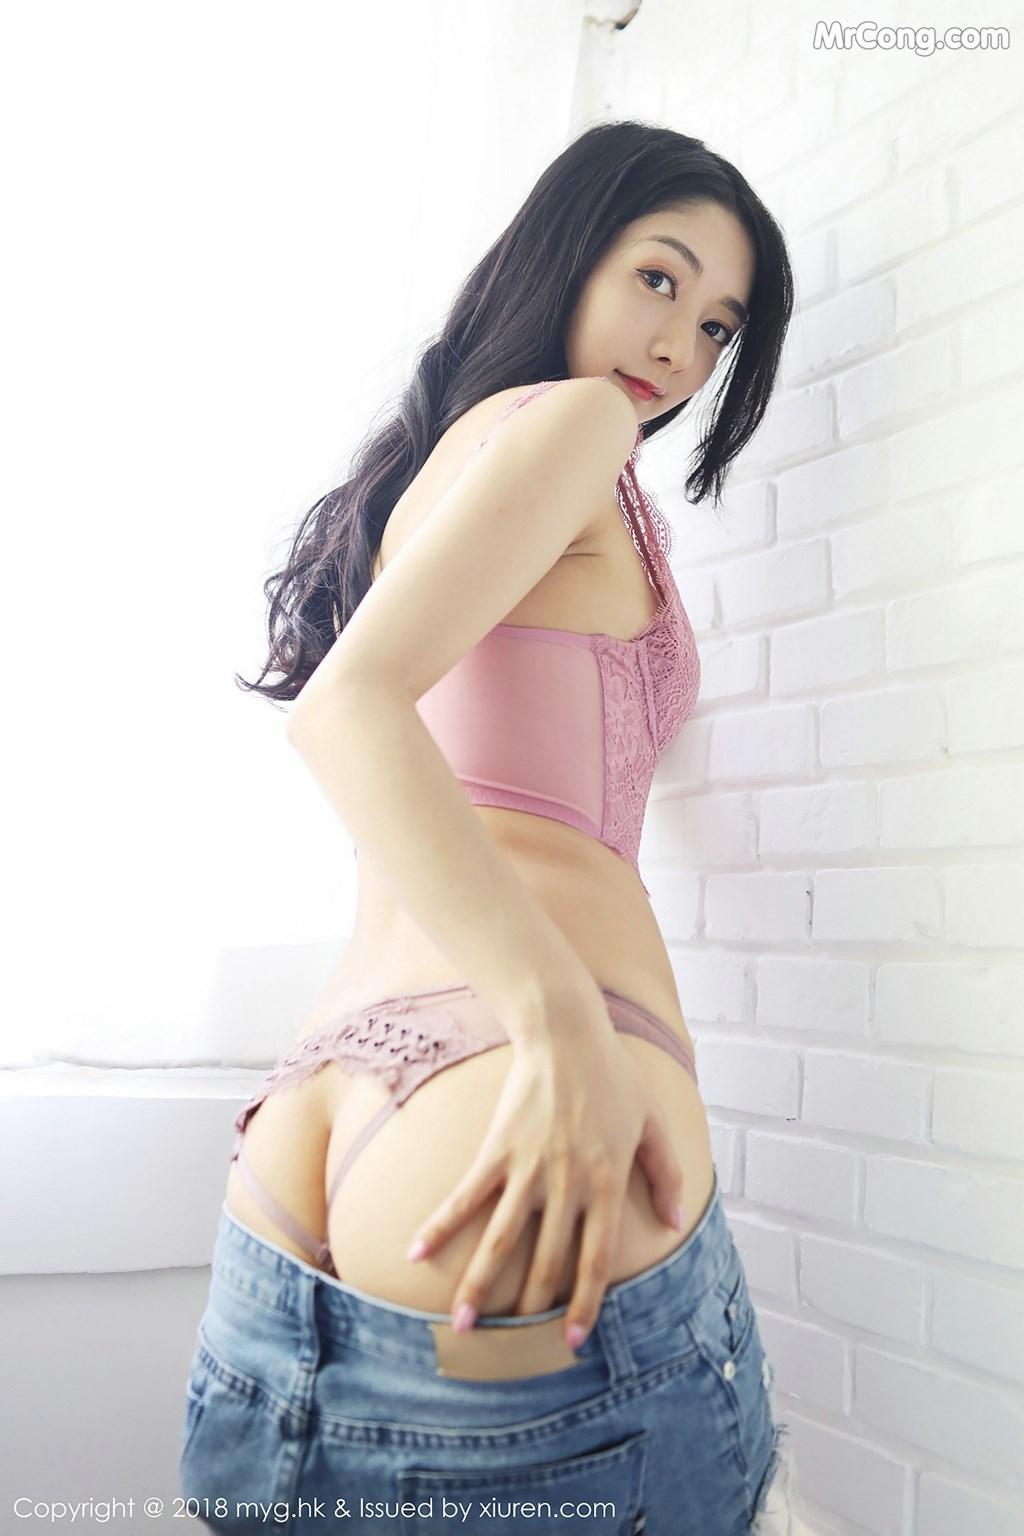 Image MyGirl-Vol.322-Xiao-Reba-Angela-MrCong.com-006 in post MyGirl Vol.322: Người mẫu Xiao Reba (Angela小热巴) (55 ảnh)